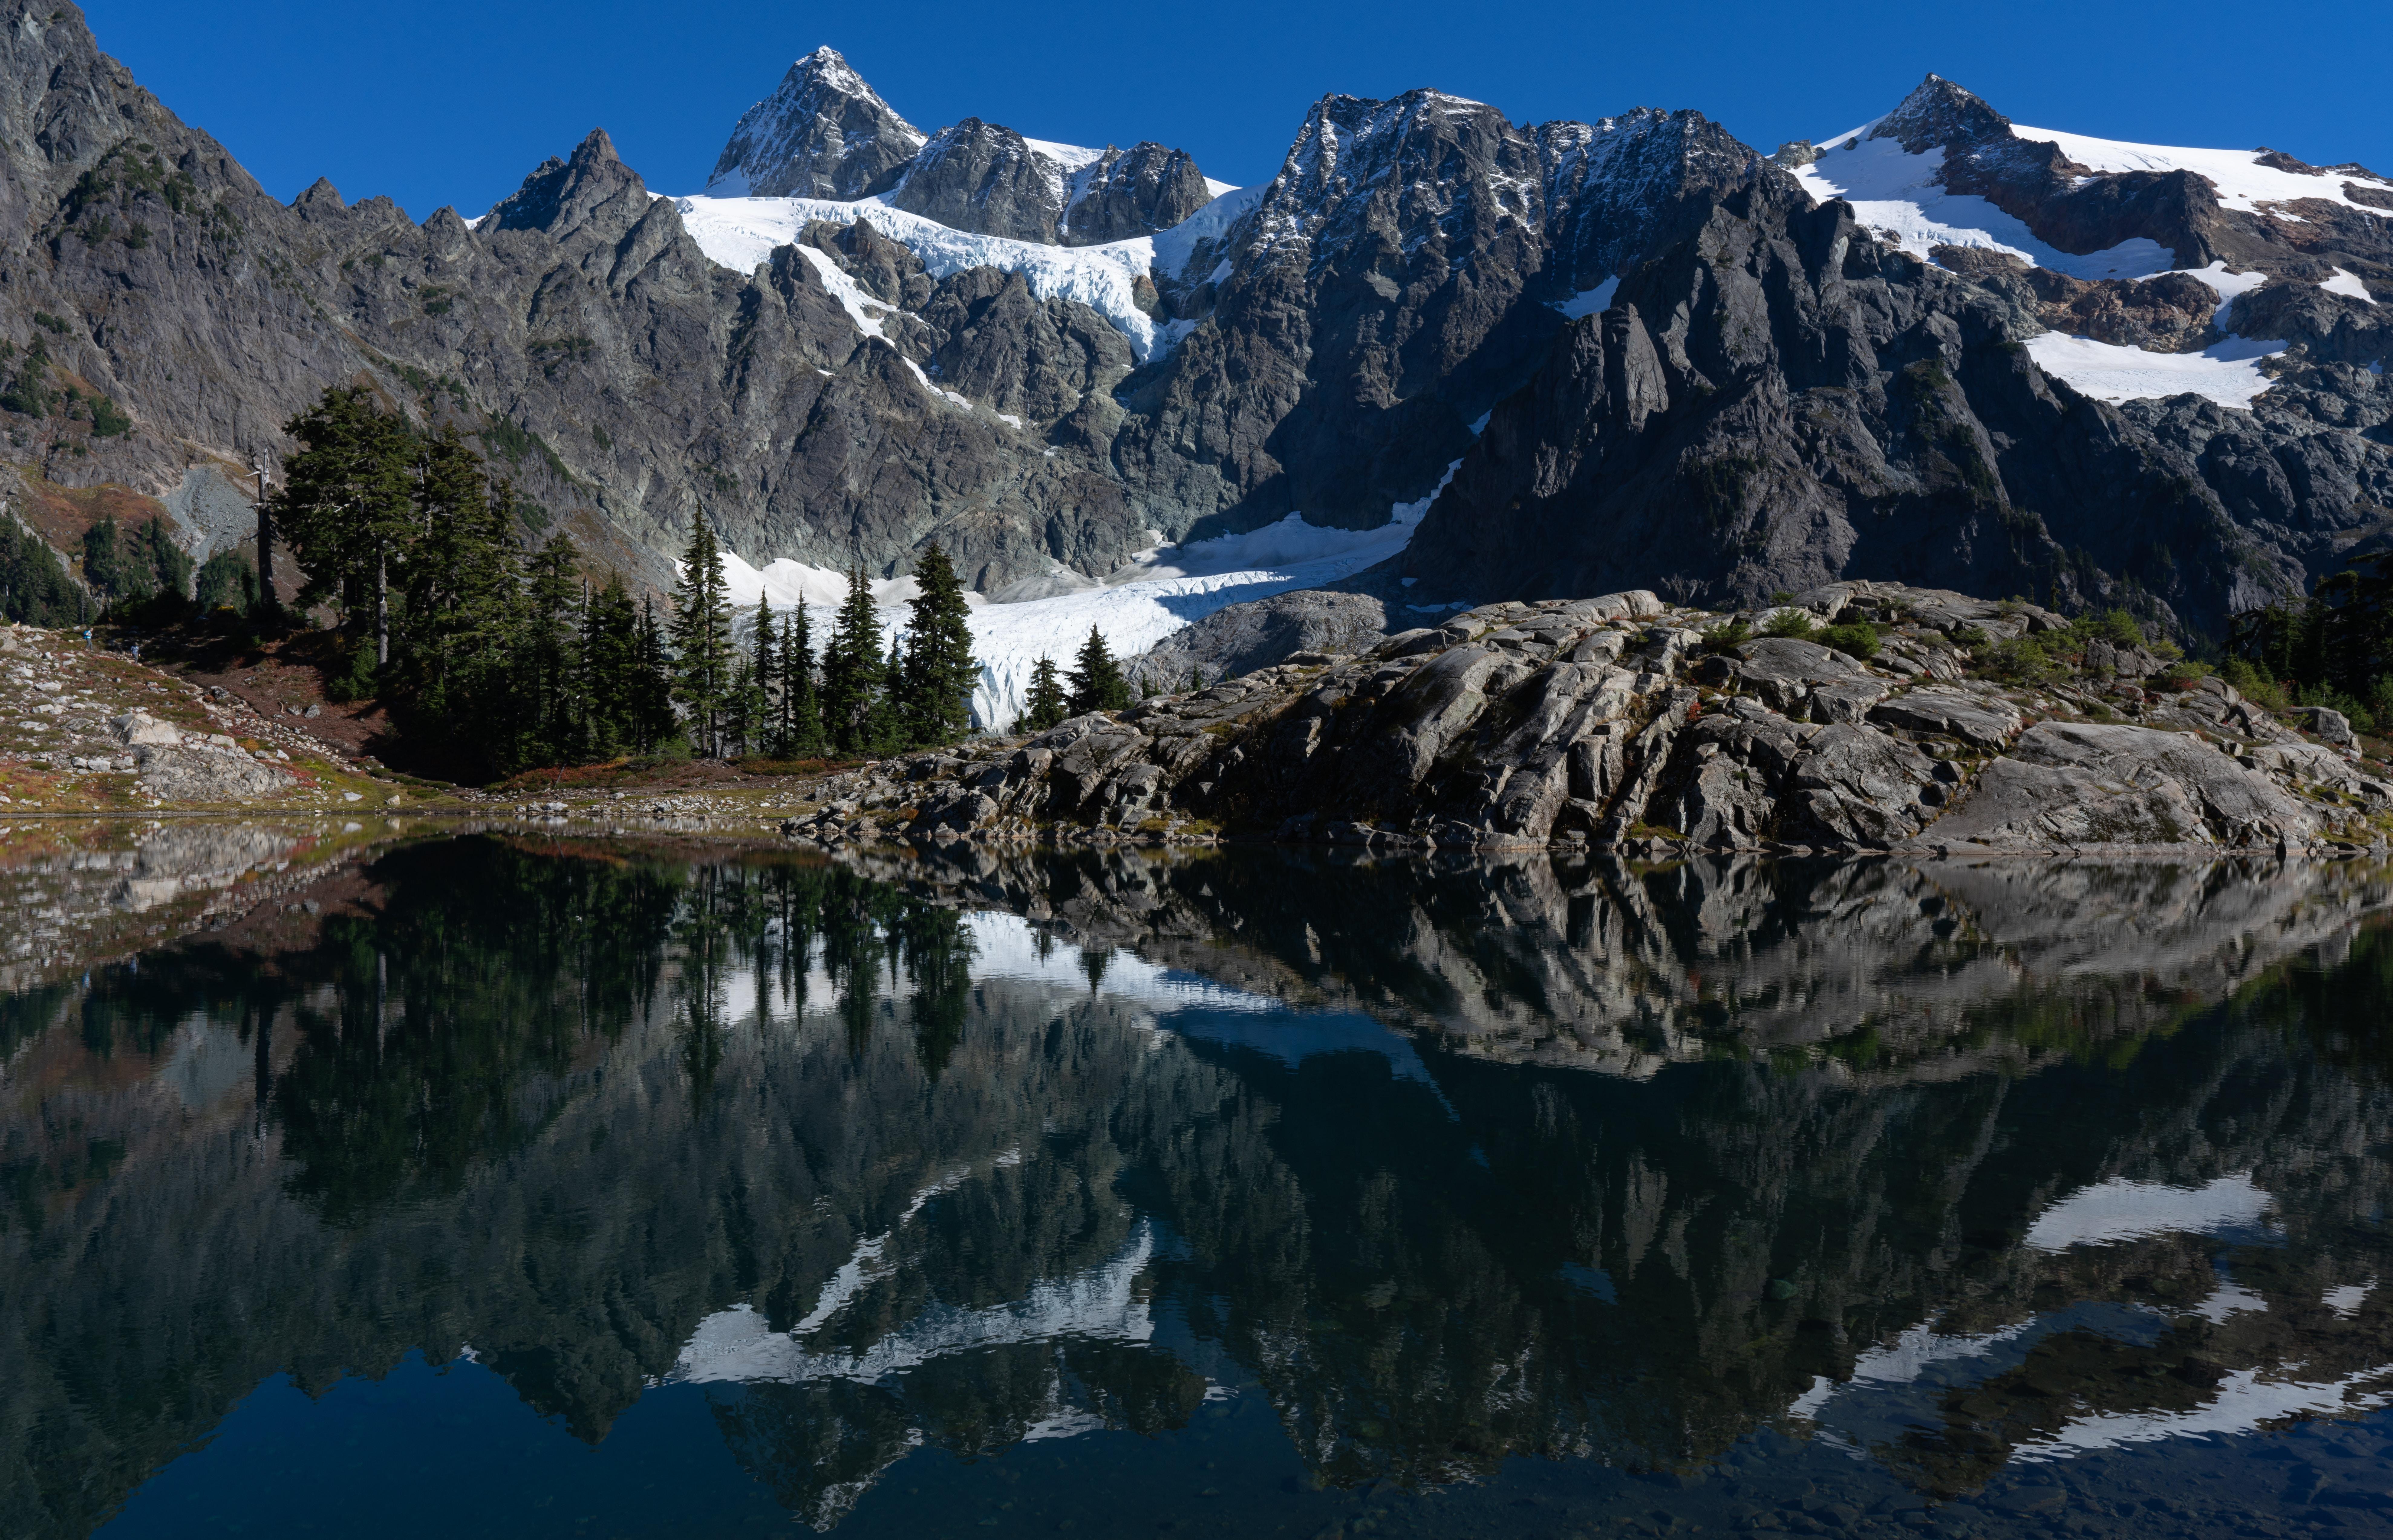 landscape photography of mountain near lake